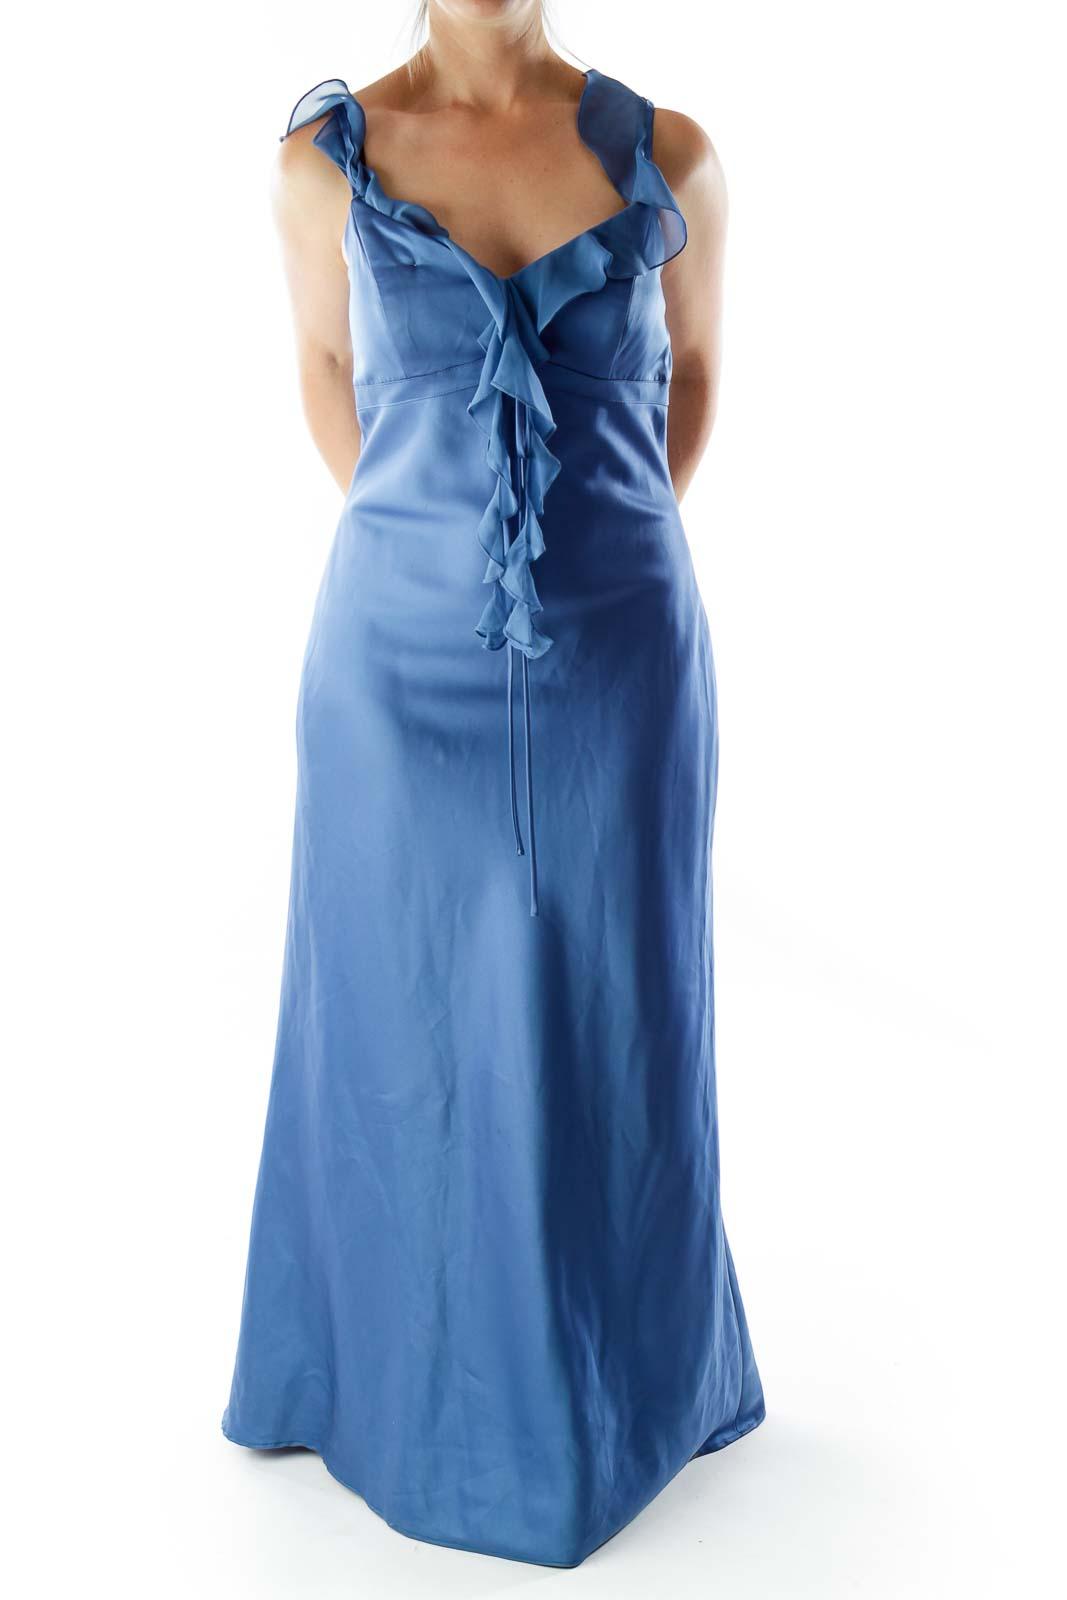 Blue V-Neck Ruffled Evening Dress Front